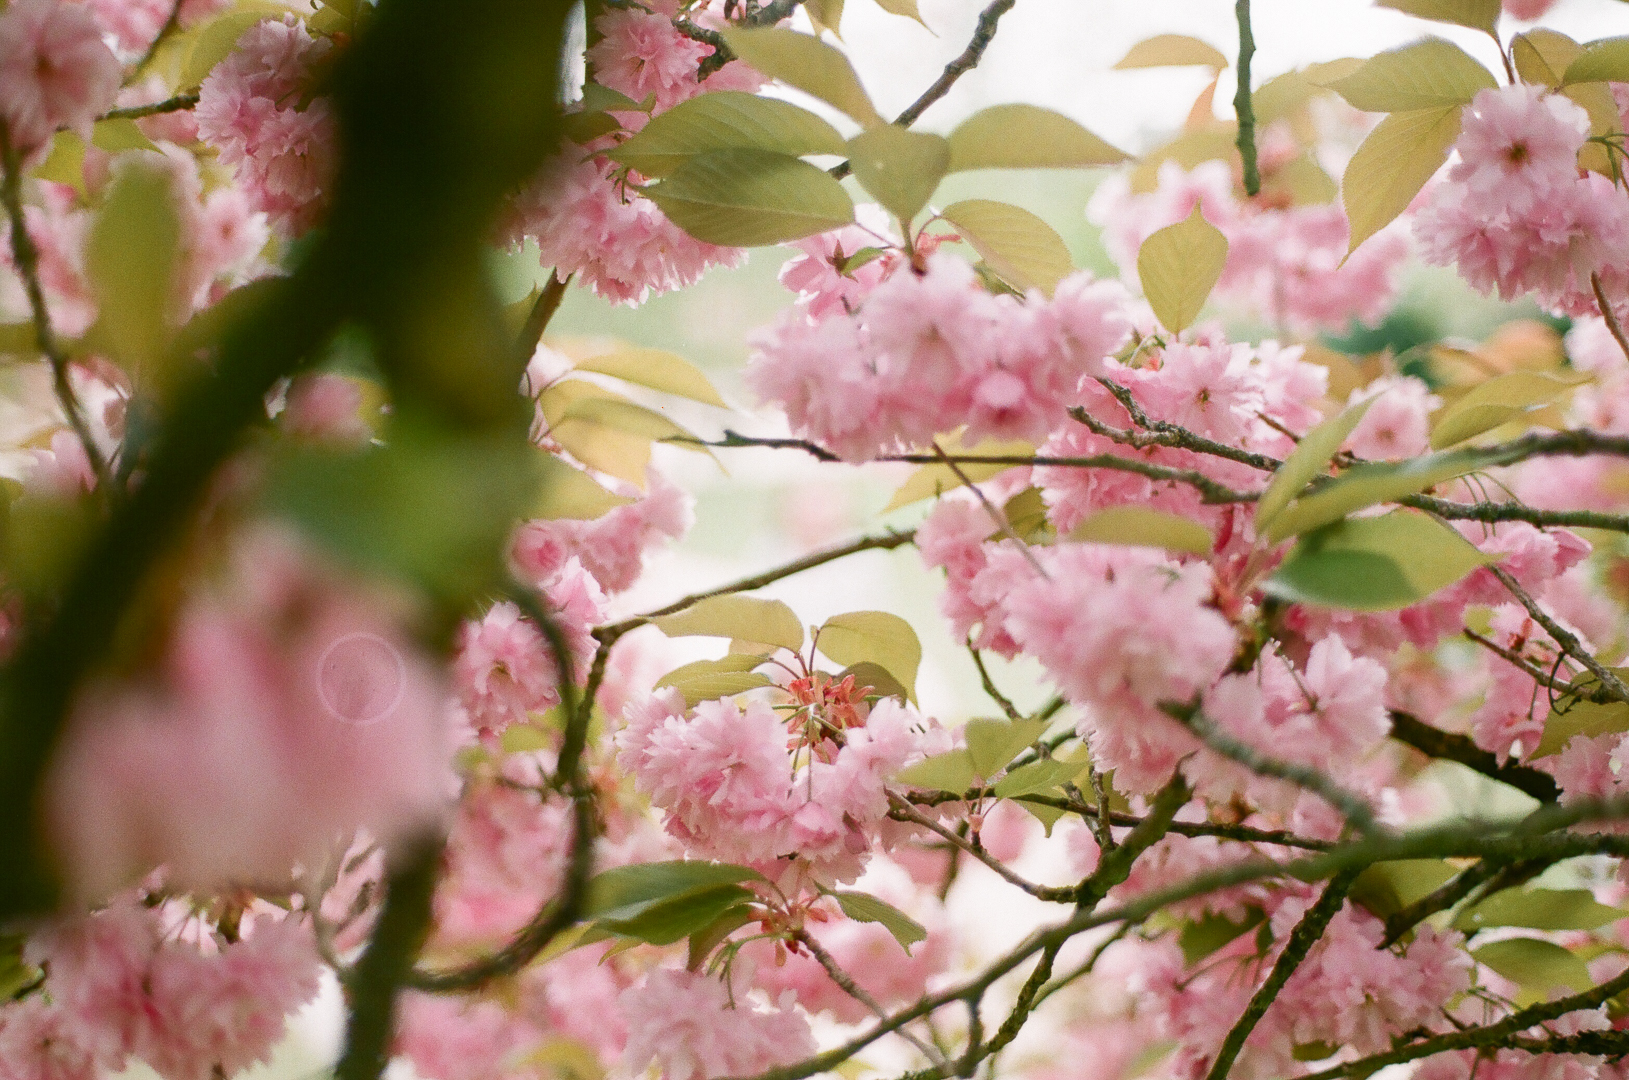 Spring through an analog lens